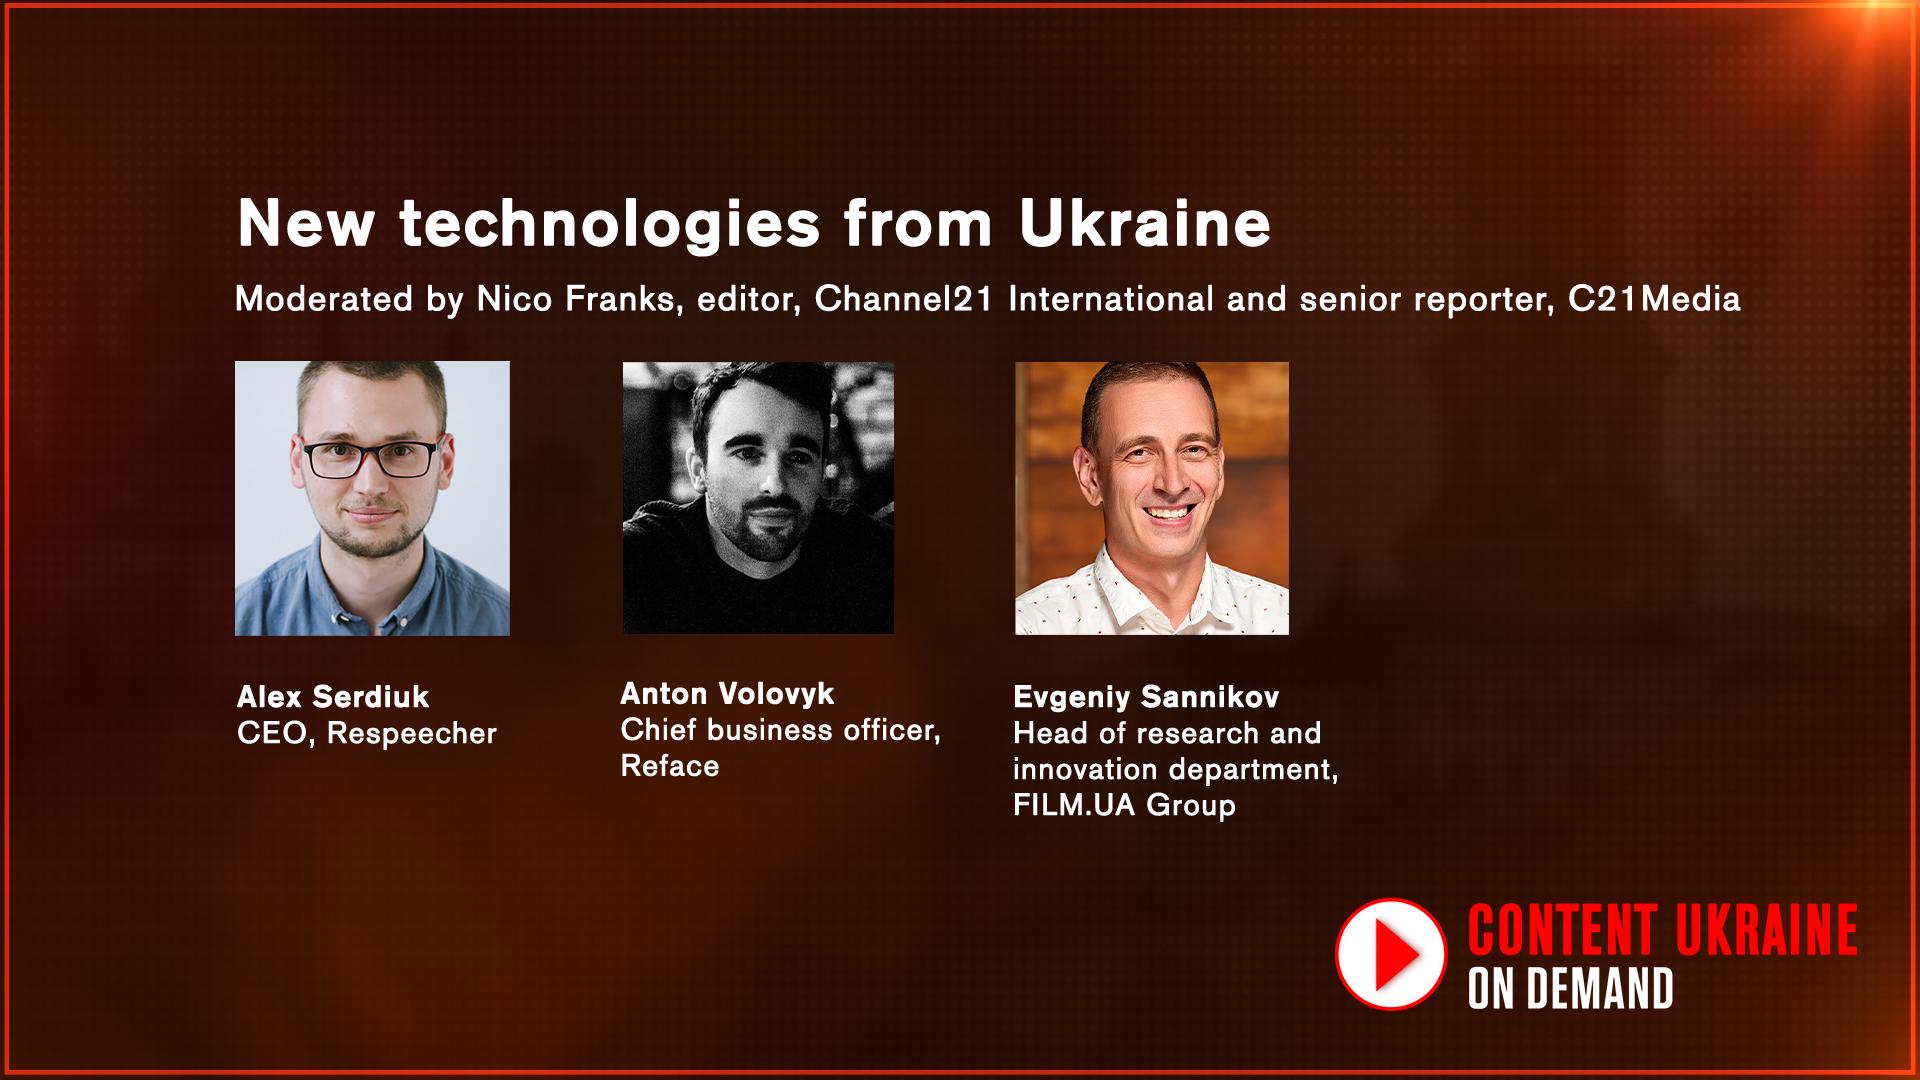 New technologies from Ukraine